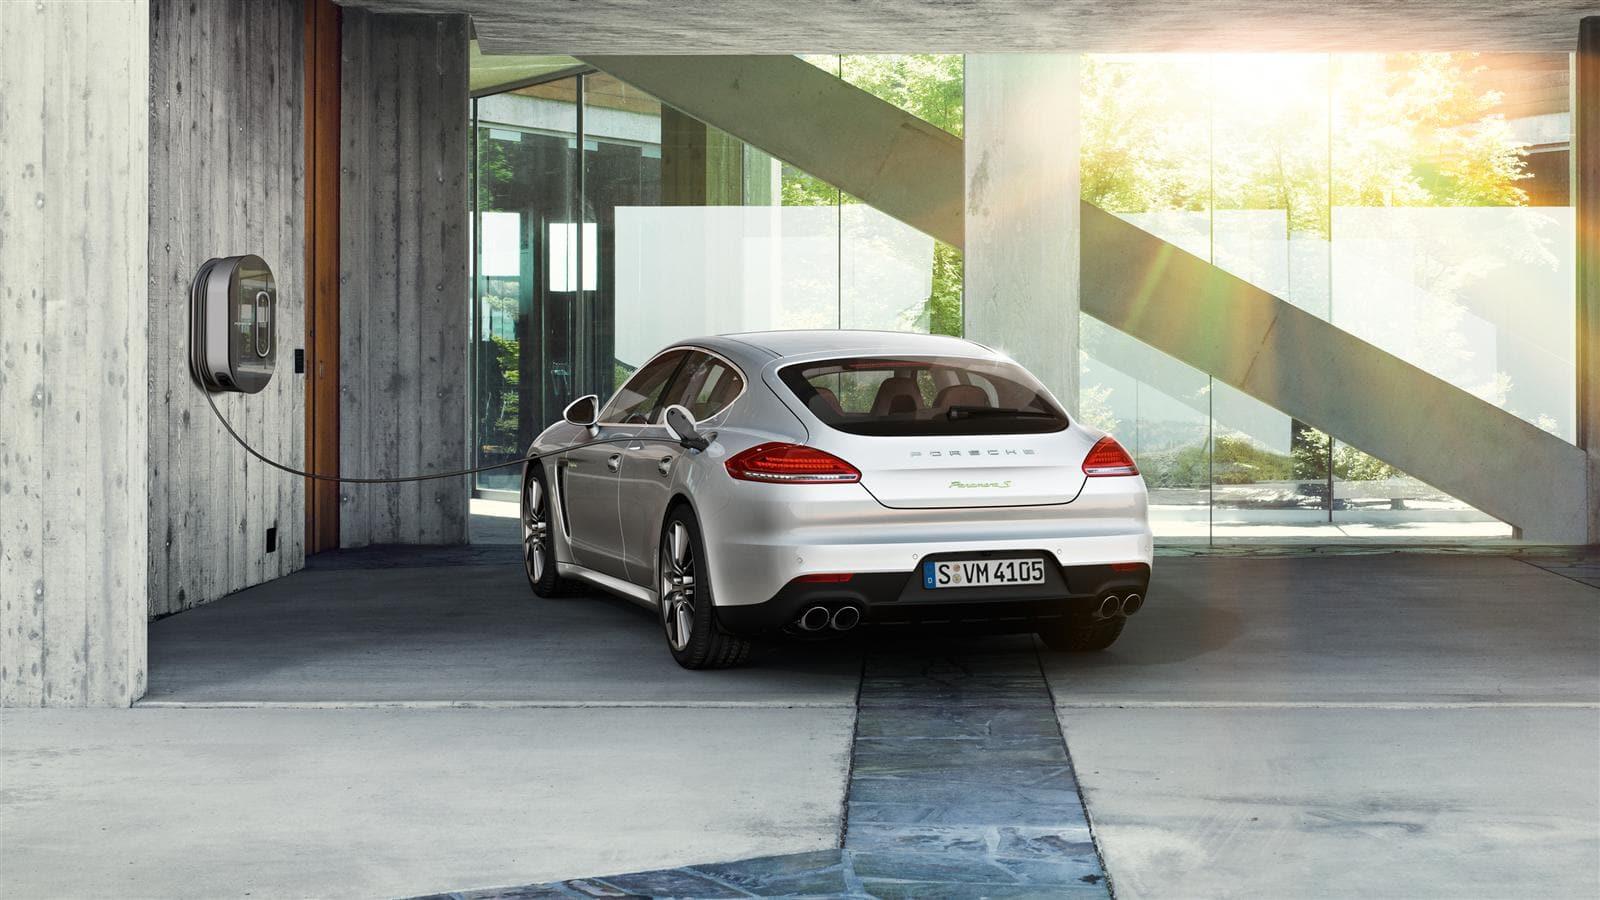 2015 Porsche Panamera S E-Hybrid